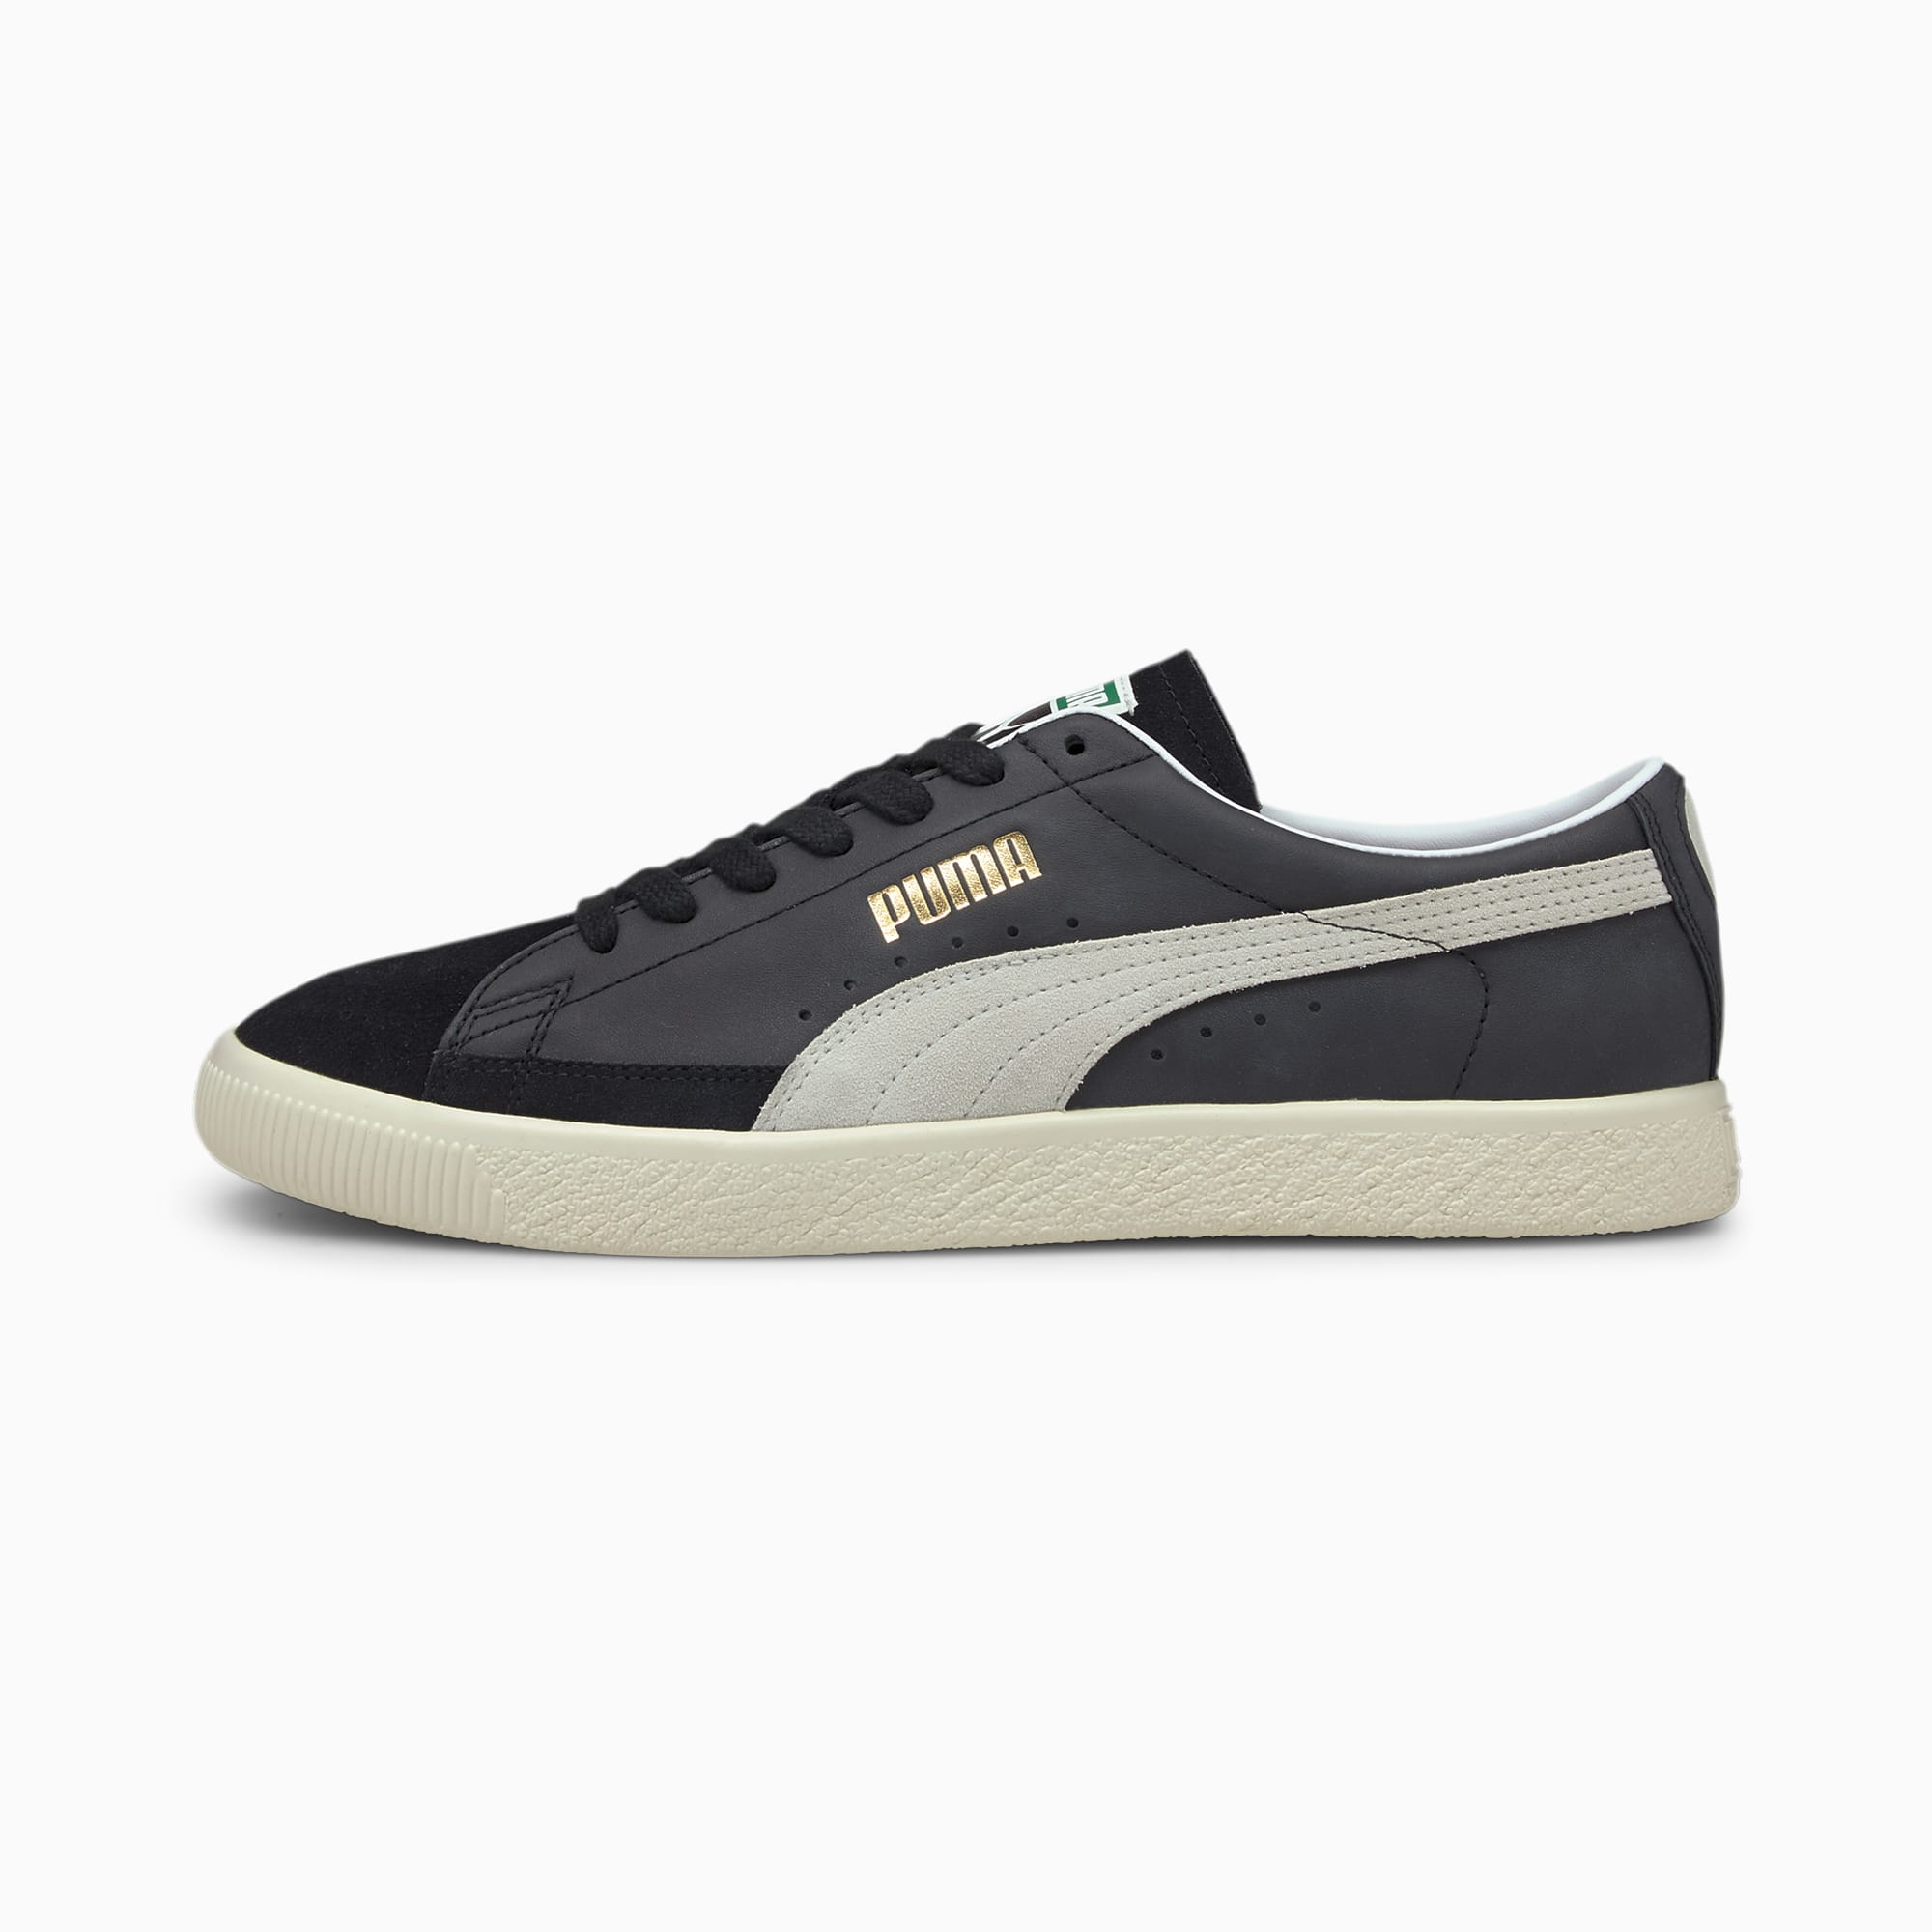 Basket VTG sneakers, Wit/Zwart, Maat 42,5   PUMA